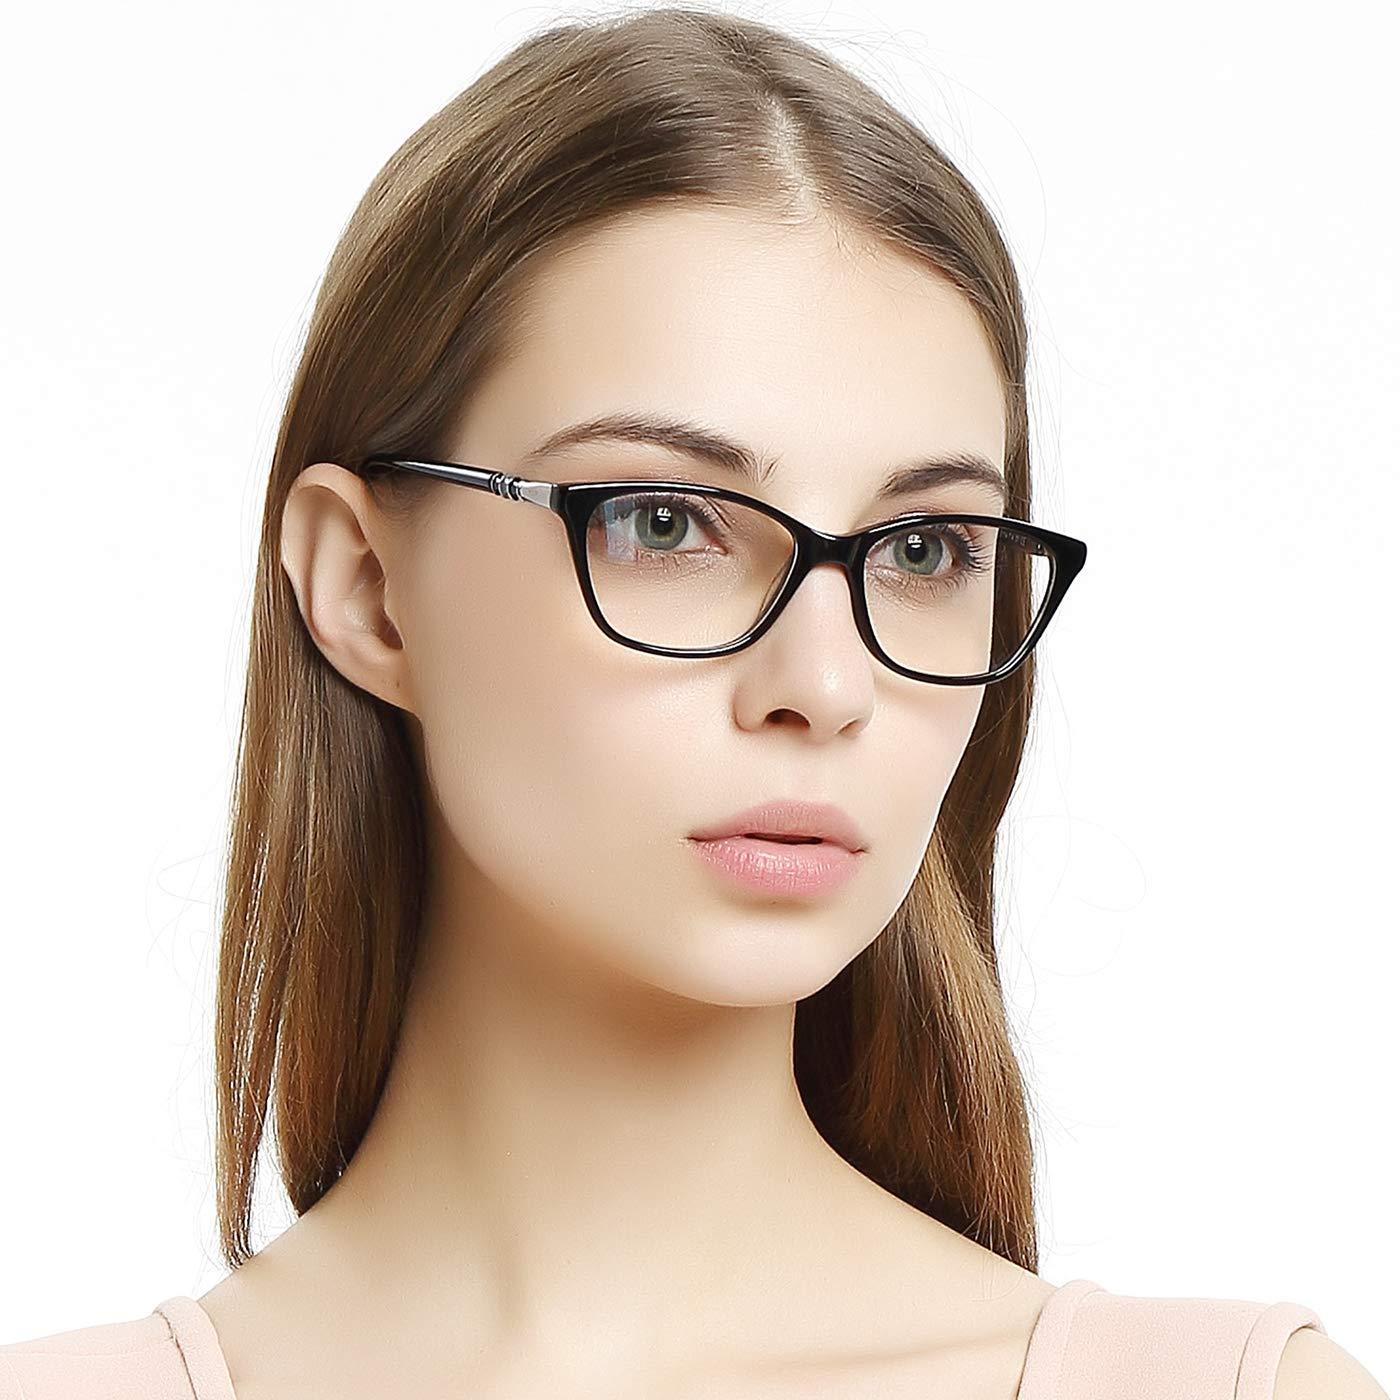 a4752cddfb44 Amazon.com  OCCI CHIARI Women Casual Eyewear Frames Non-Prescription Clear  Lens Eyeglasses (Black 50)  Clothing